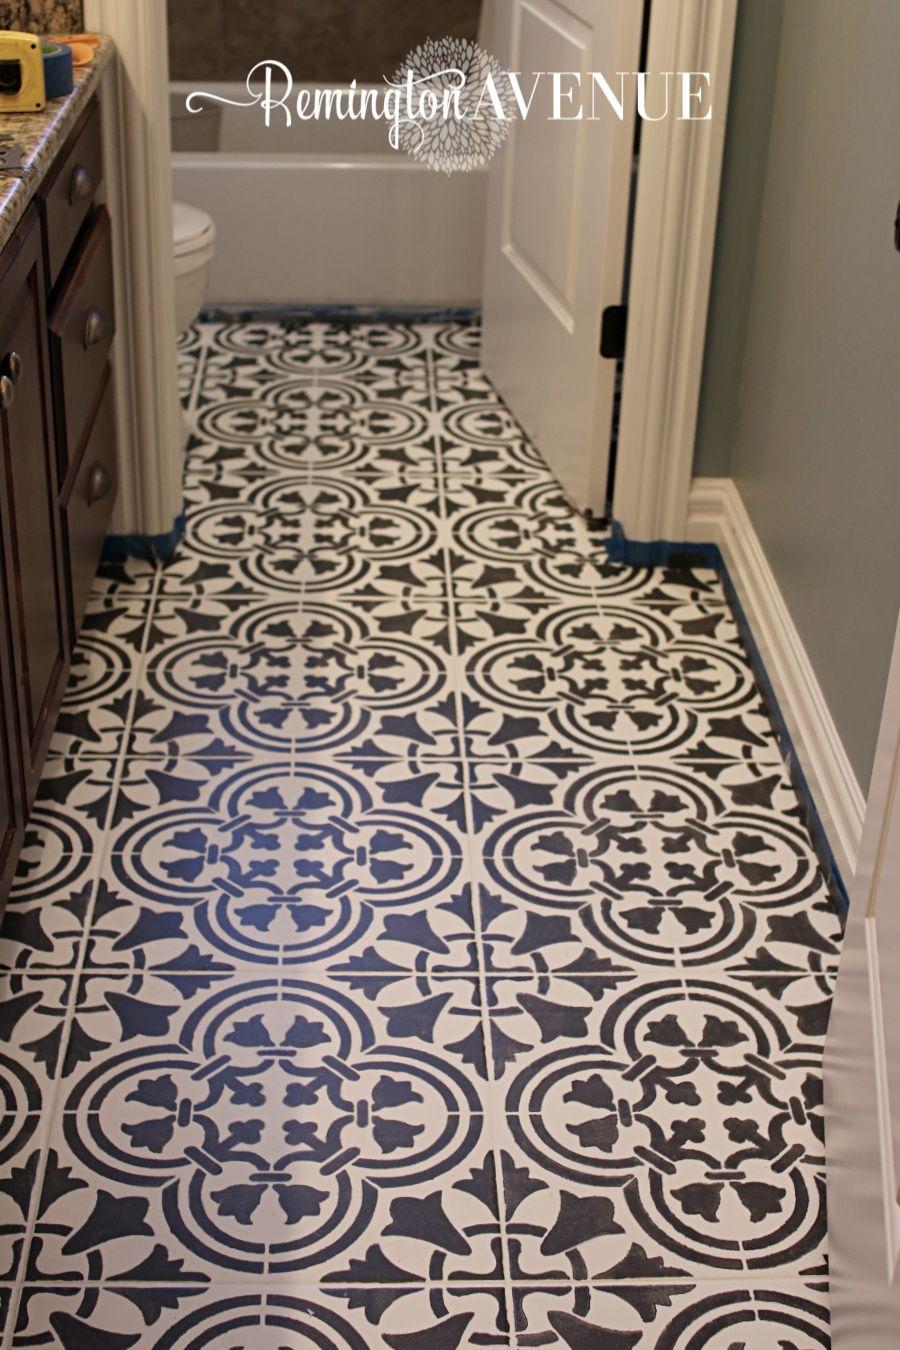 How To Paint Stencil Tile Painting Tile Floors Stenciled Tile